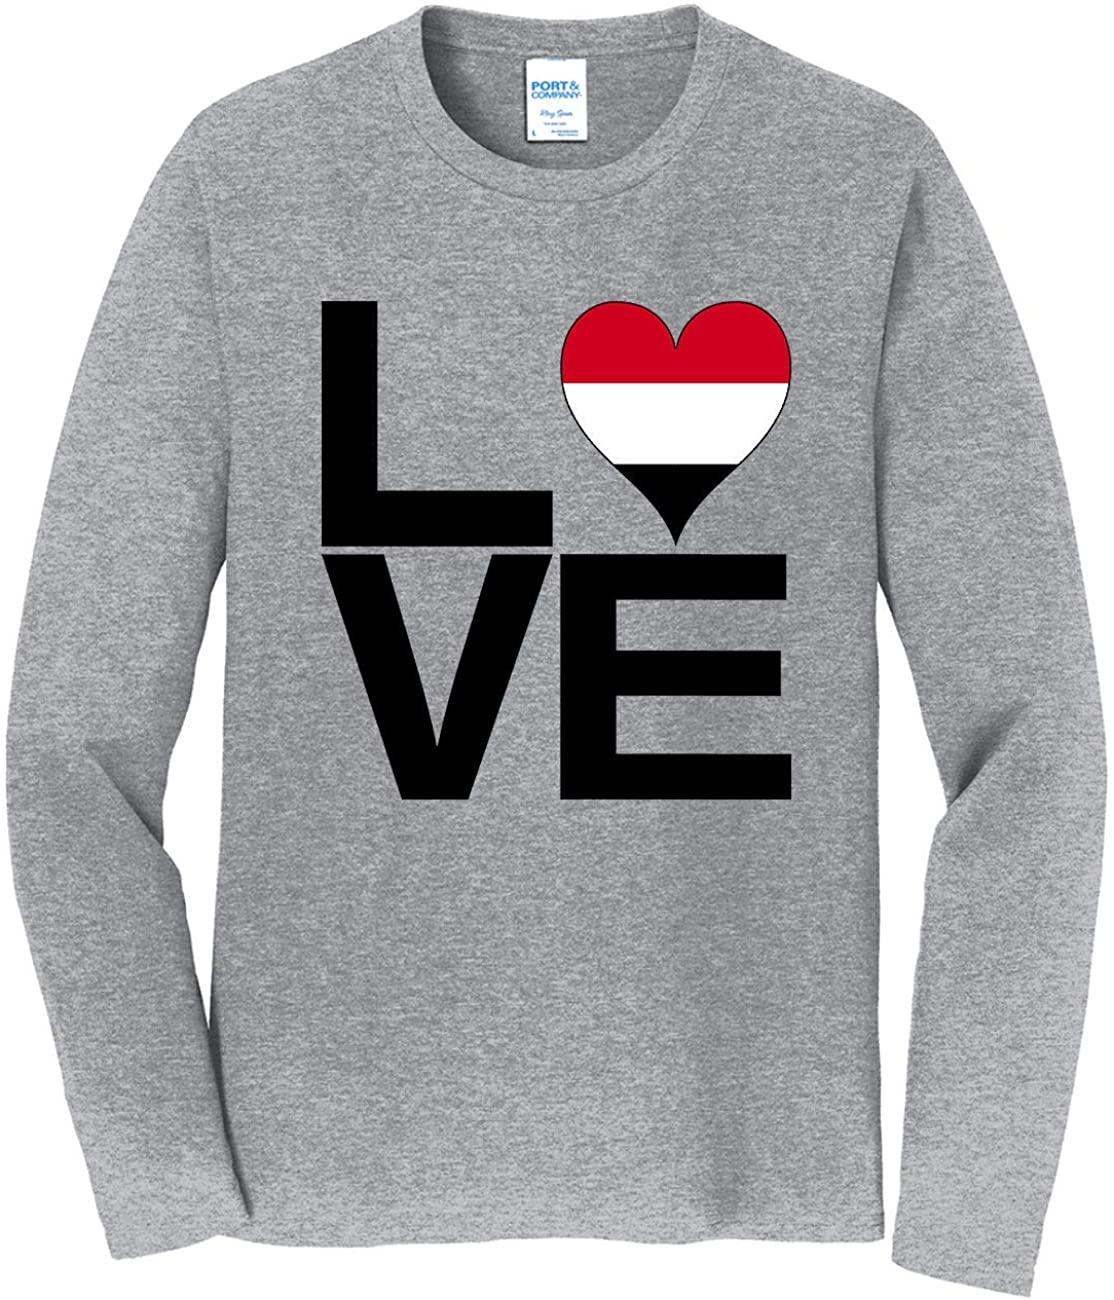 HARD EDGE DESIGN Men's Love Block Yemen Heart Long Sleeve T-Shirt, 5X-Large, Heather Gray